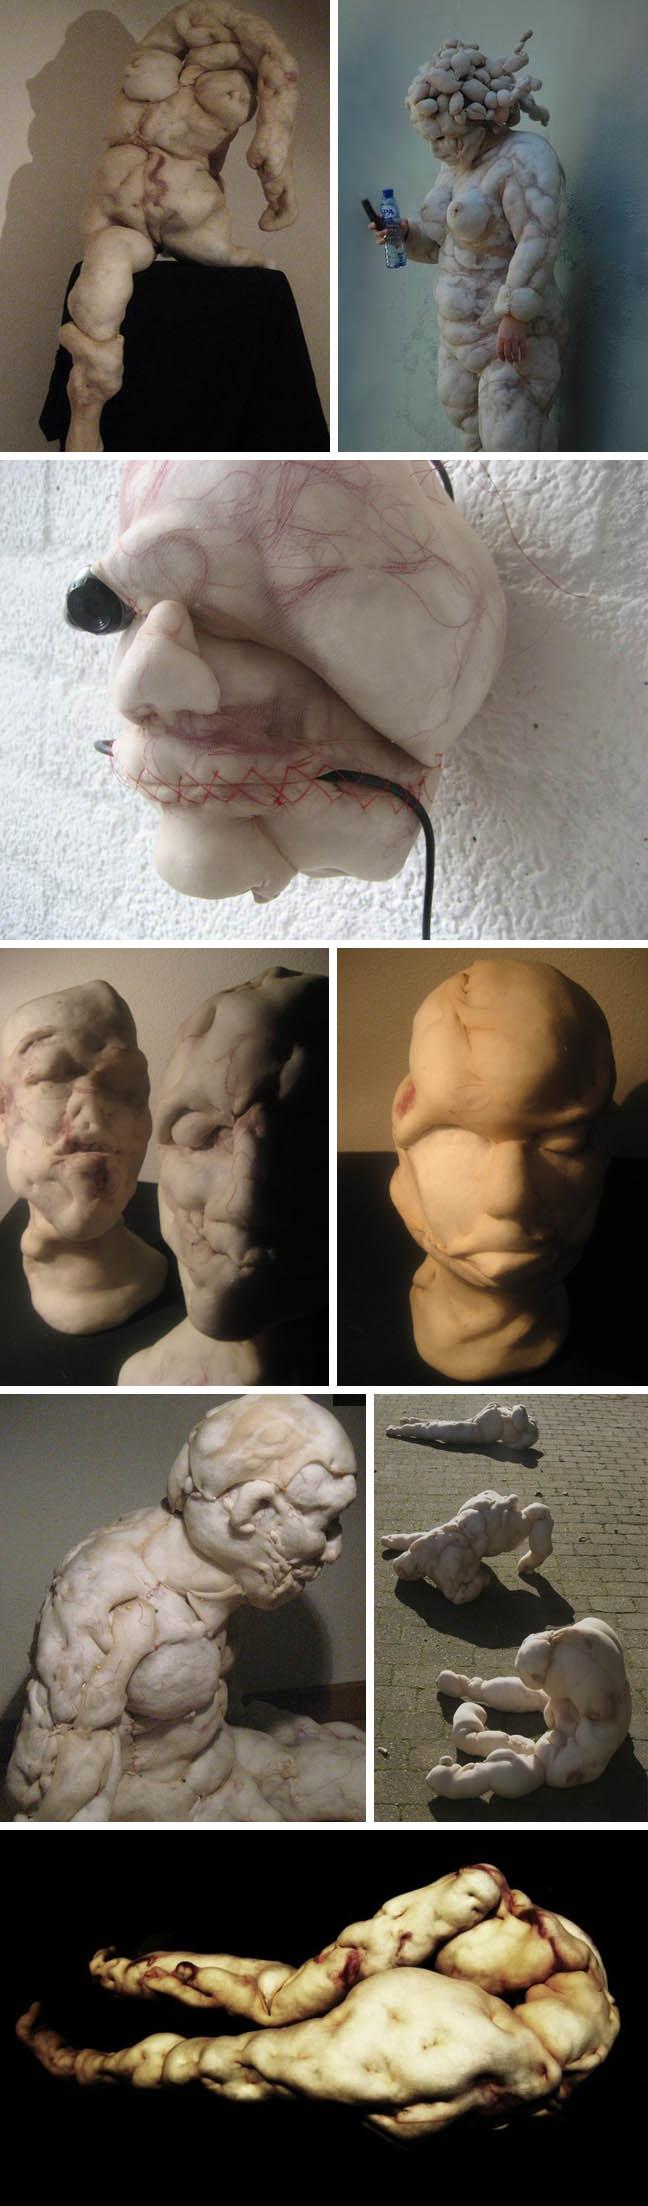 rosa-verloop_nylon-sculptures_nylon-portraits_collabcubed (1).jpg